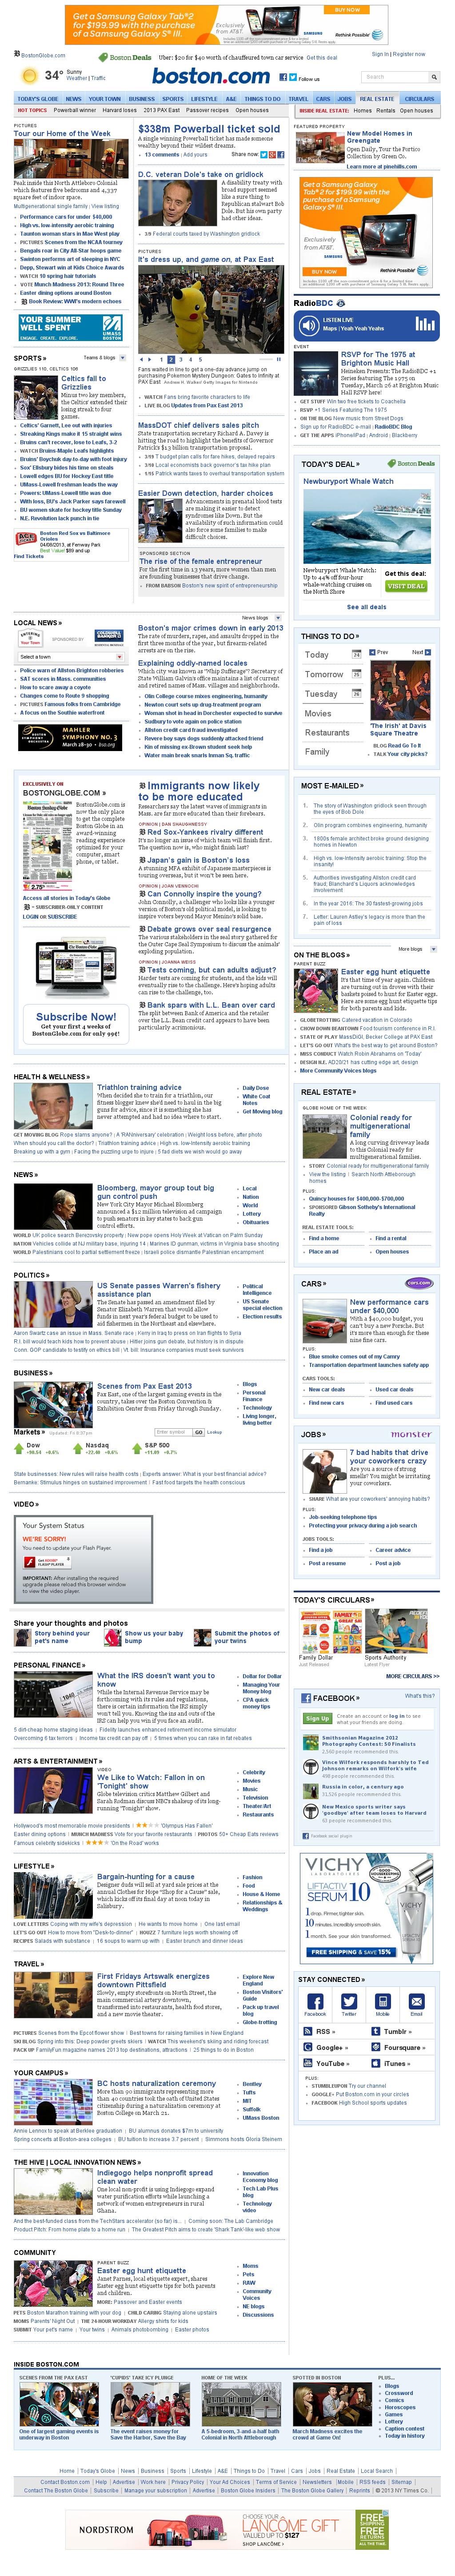 Boston.com at Sunday March 24, 2013, 1:04 p.m. UTC